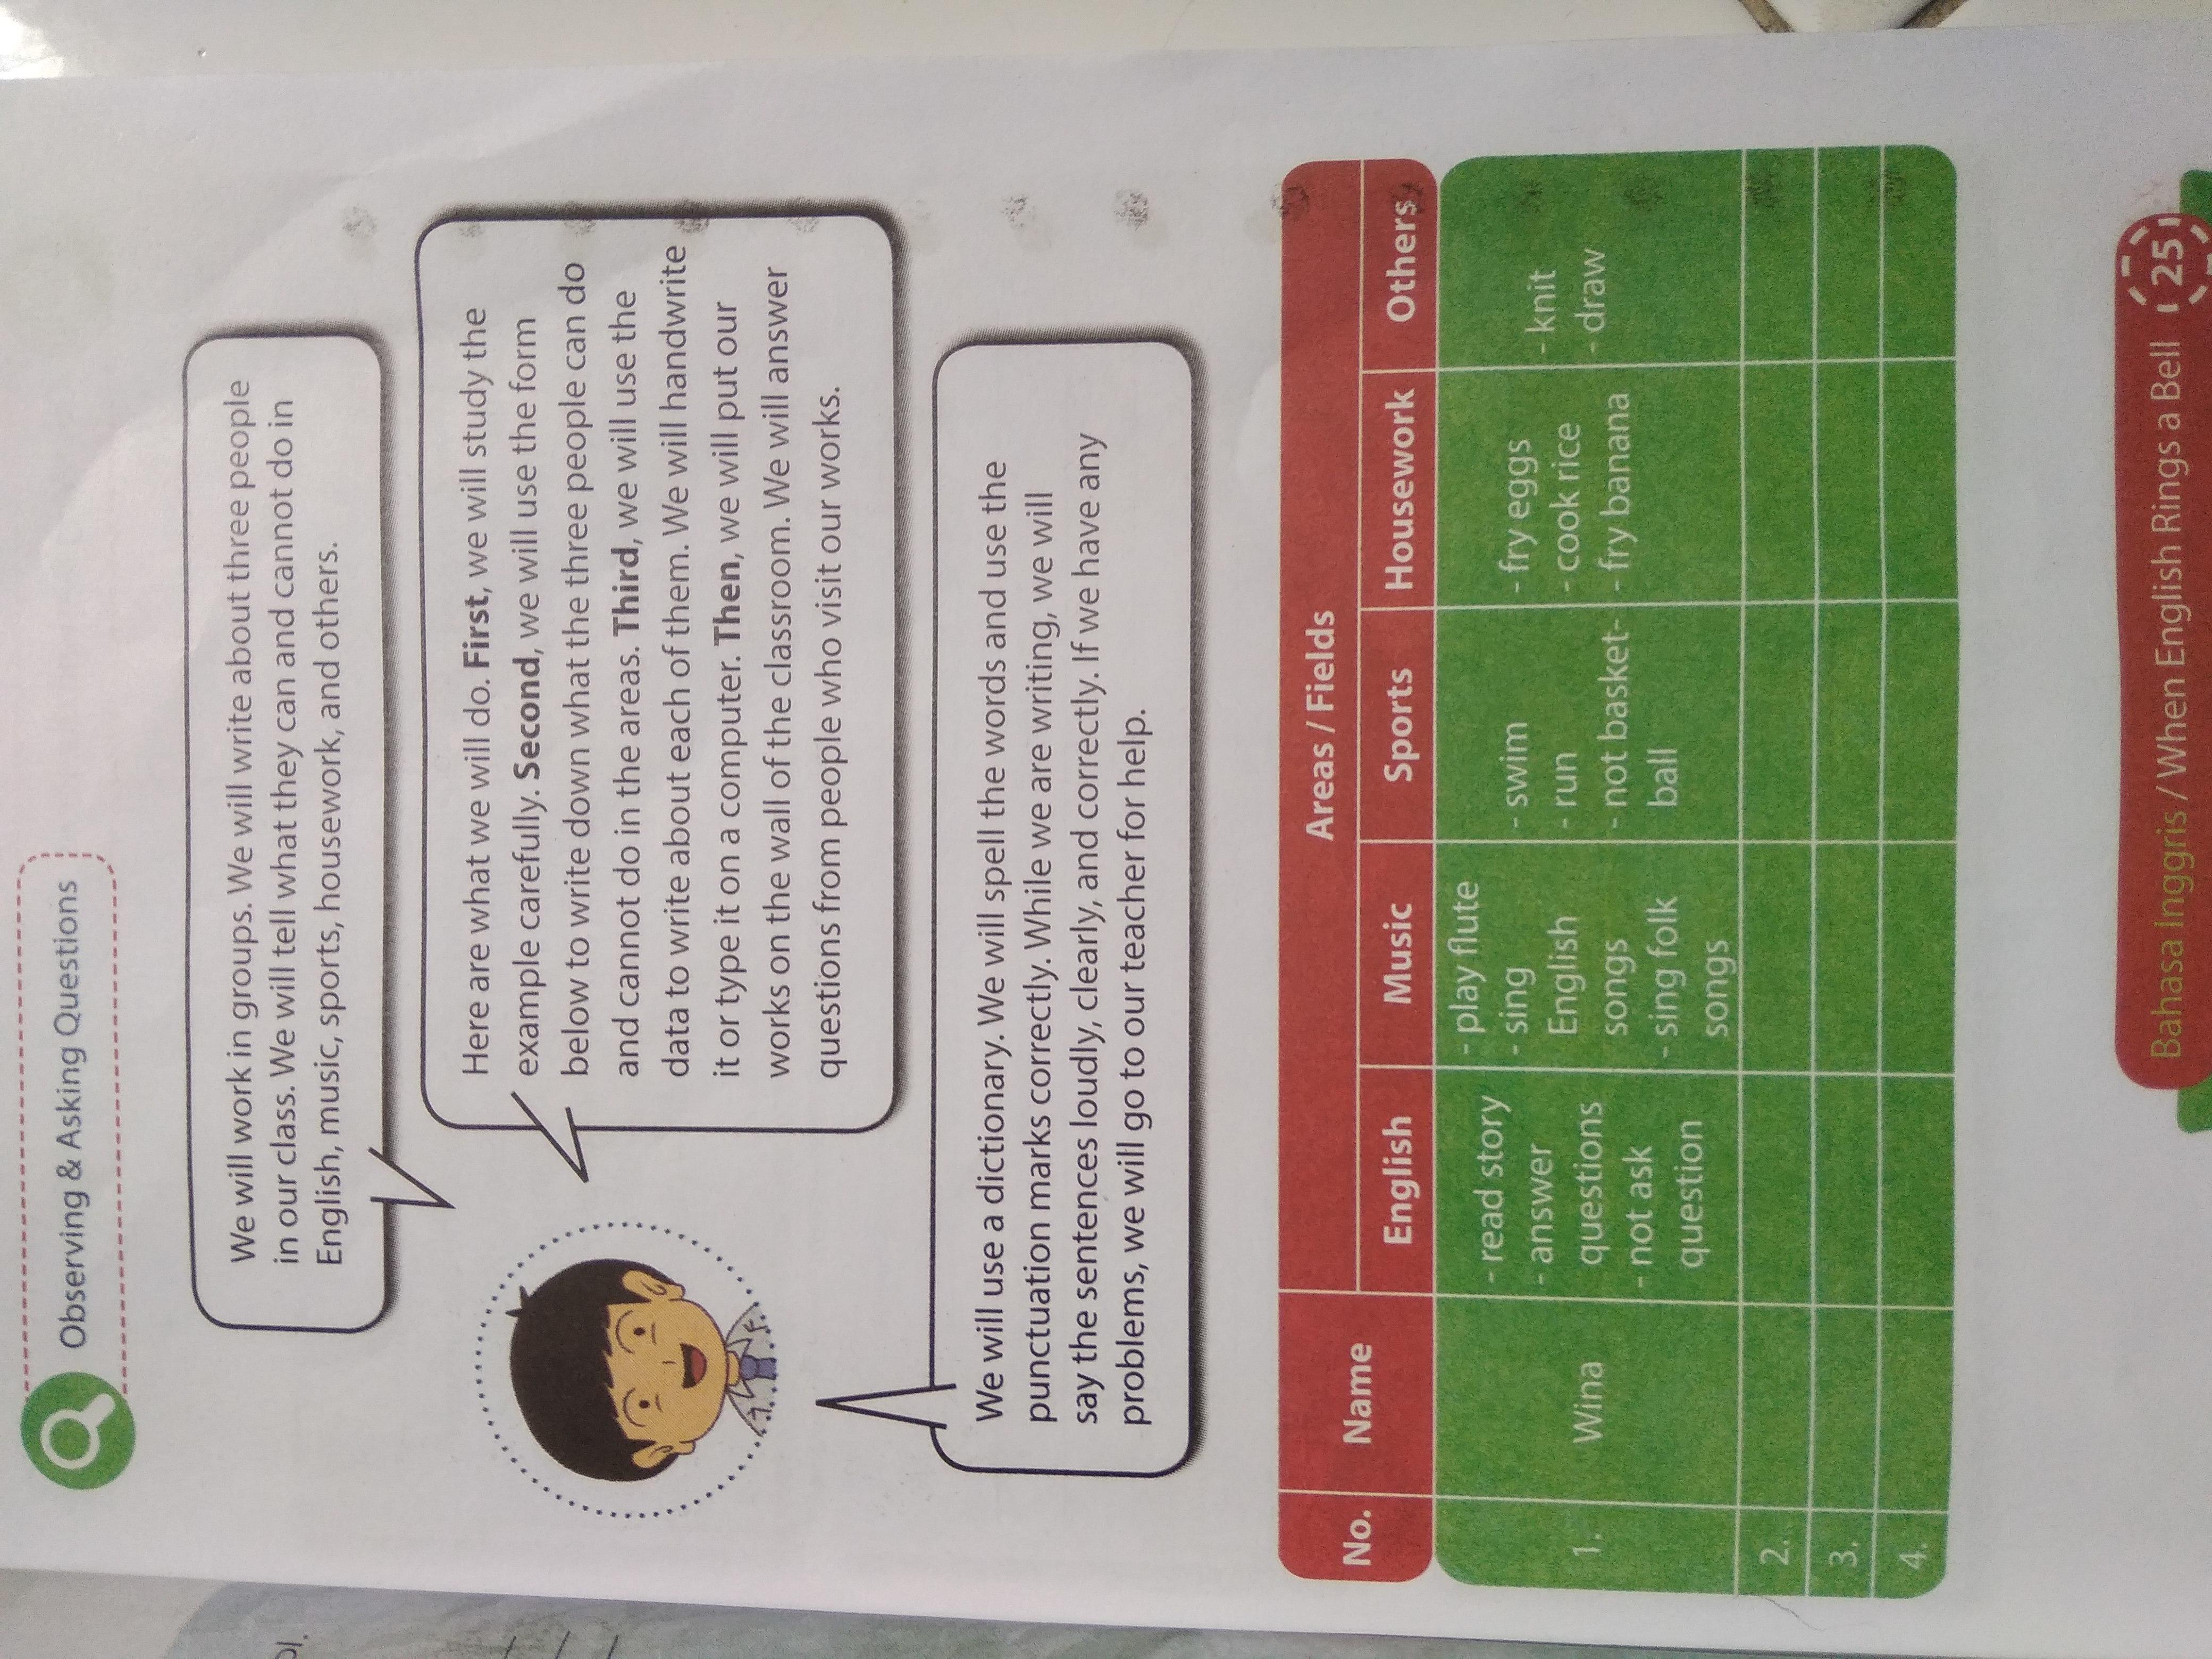 Halaman 25 Dan 26 Bhs Inggris Kelas8 Kurikulum 2013 Brainly Co Id